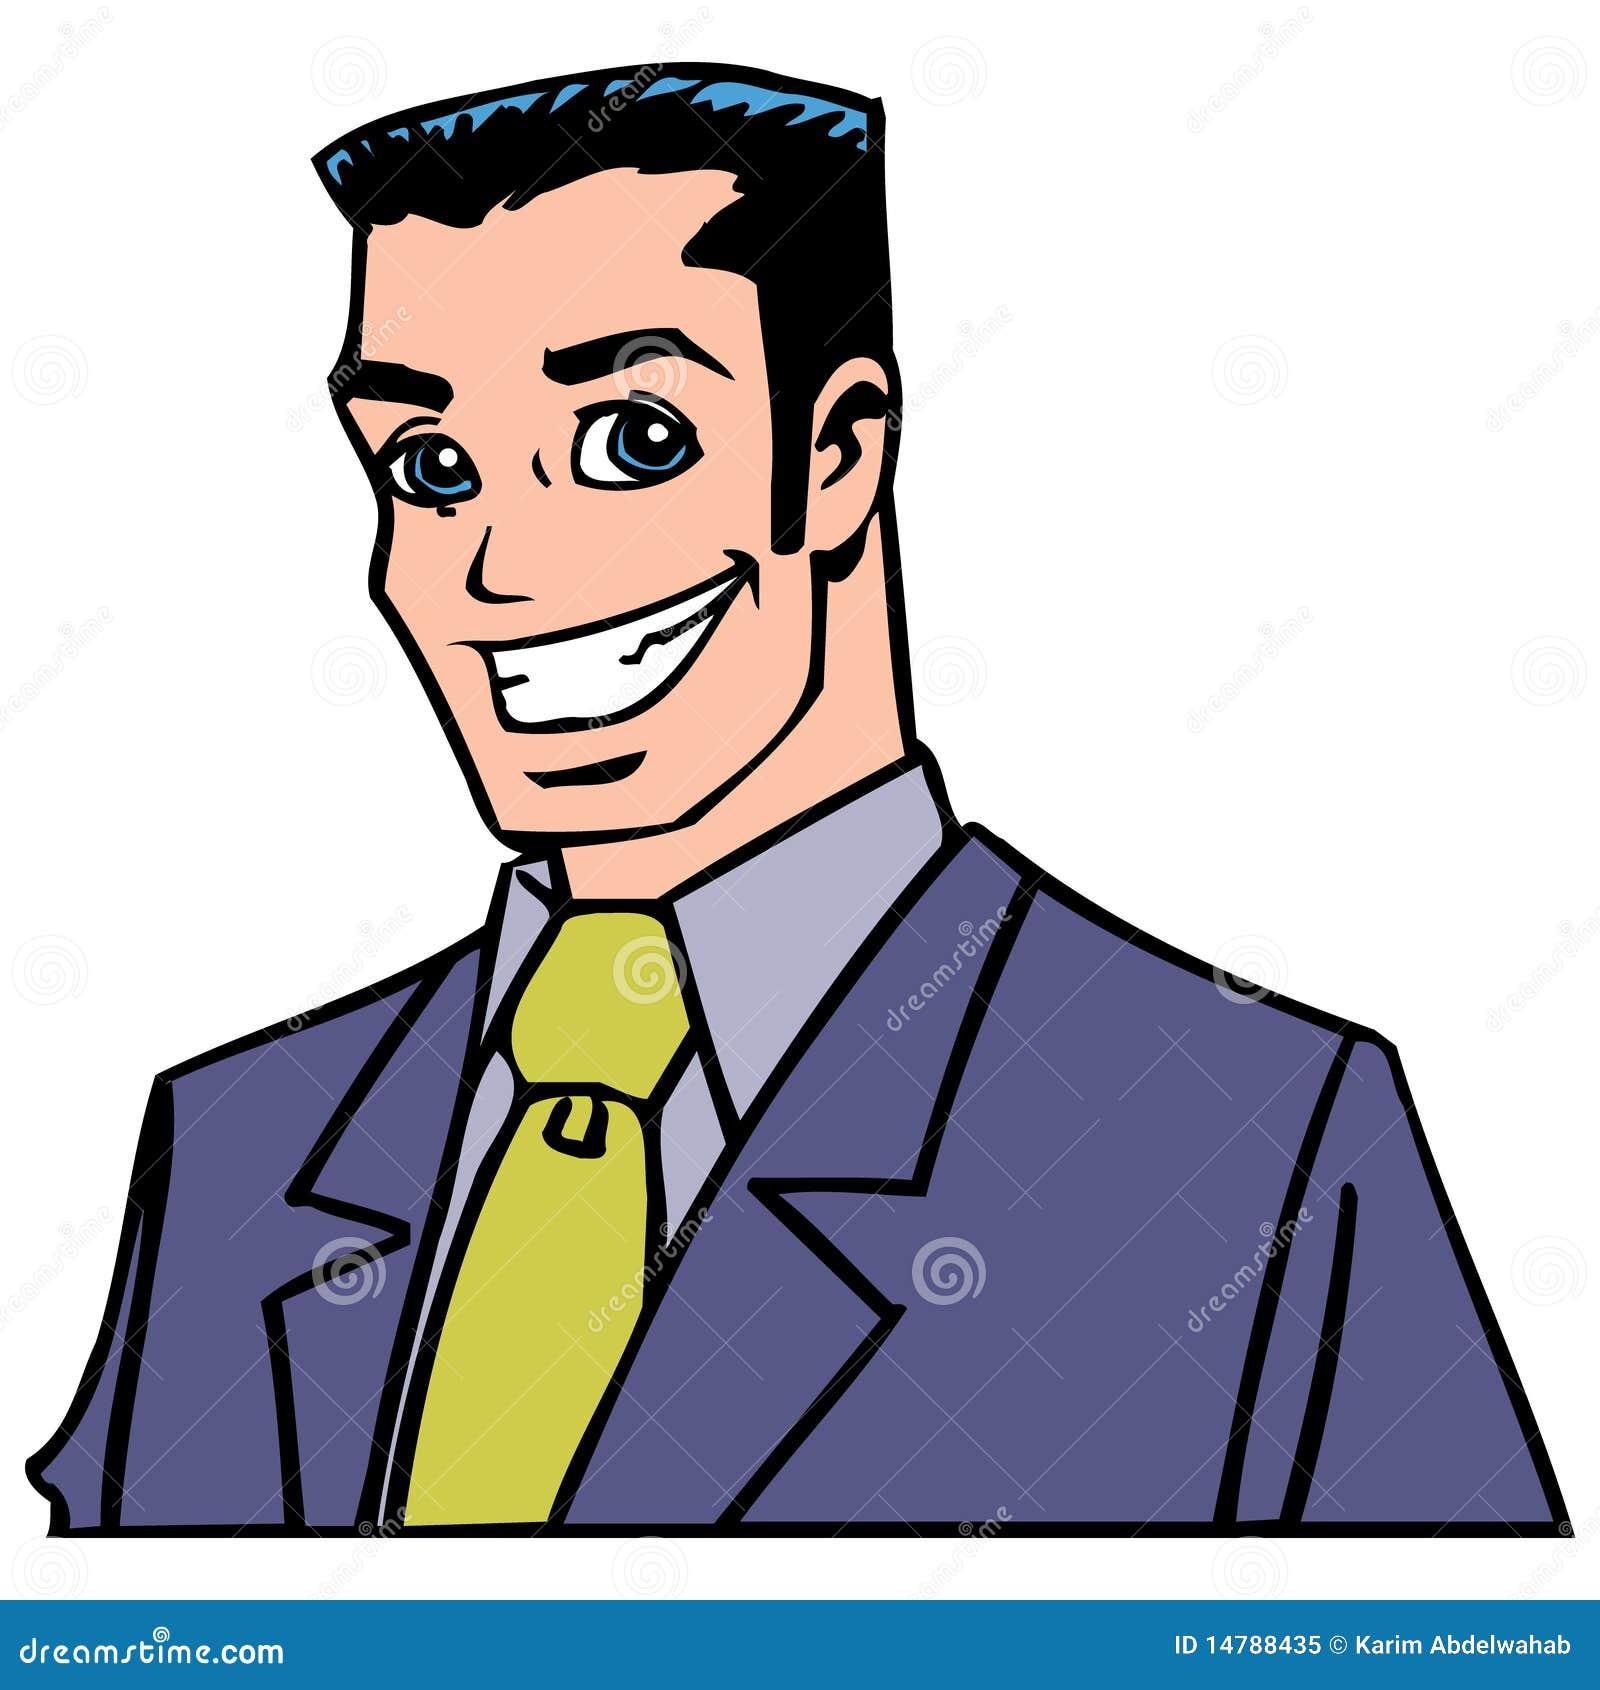 Professional Man Cartoon Royalty Free Stock Photo Image